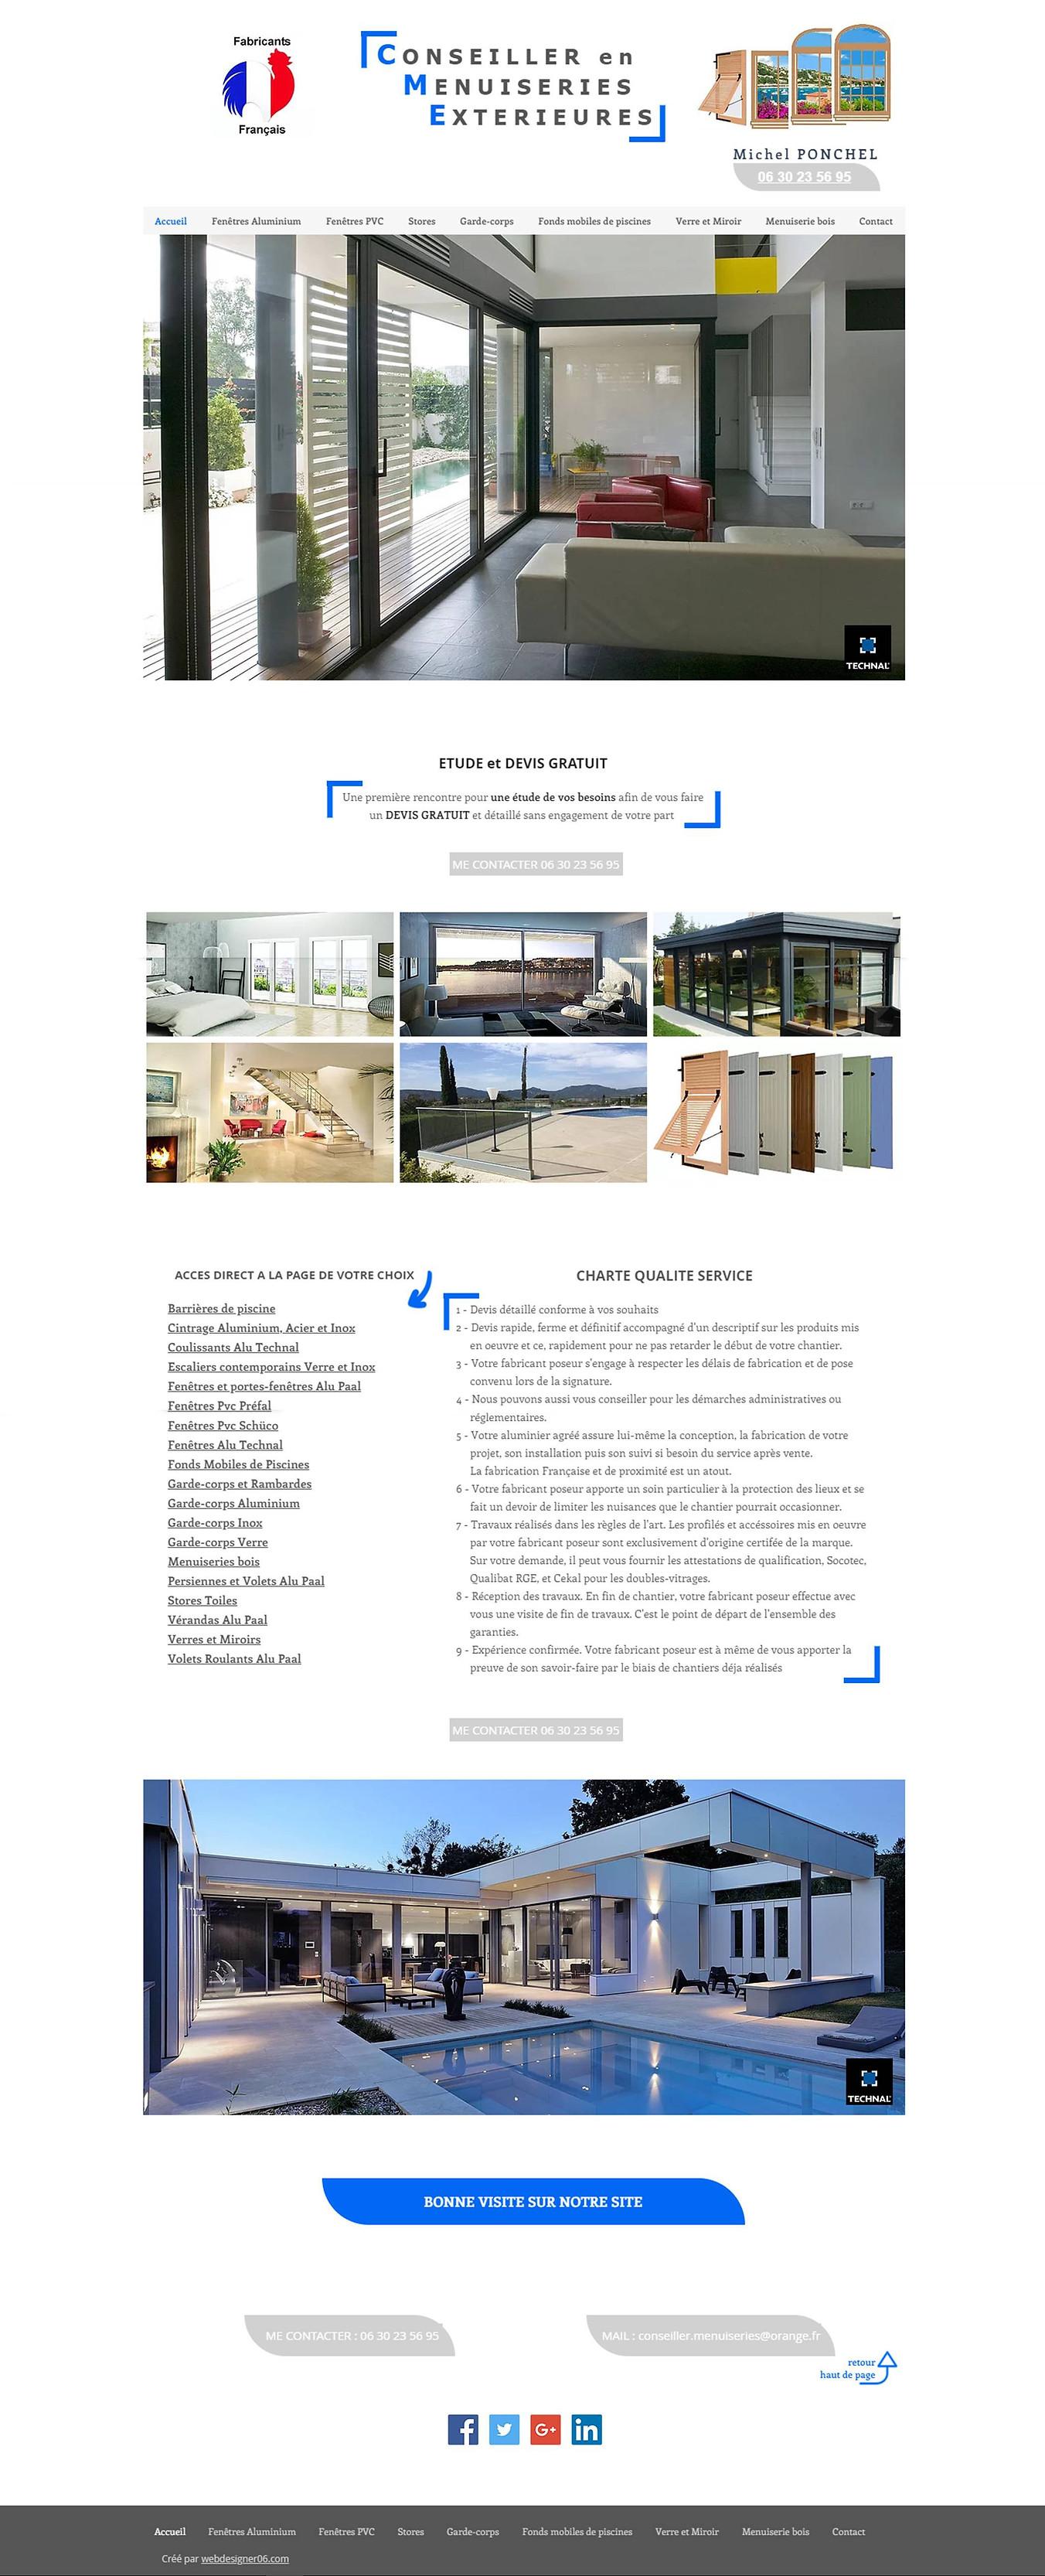 Conseiller en menuiserie extérieures bye webdesigner06